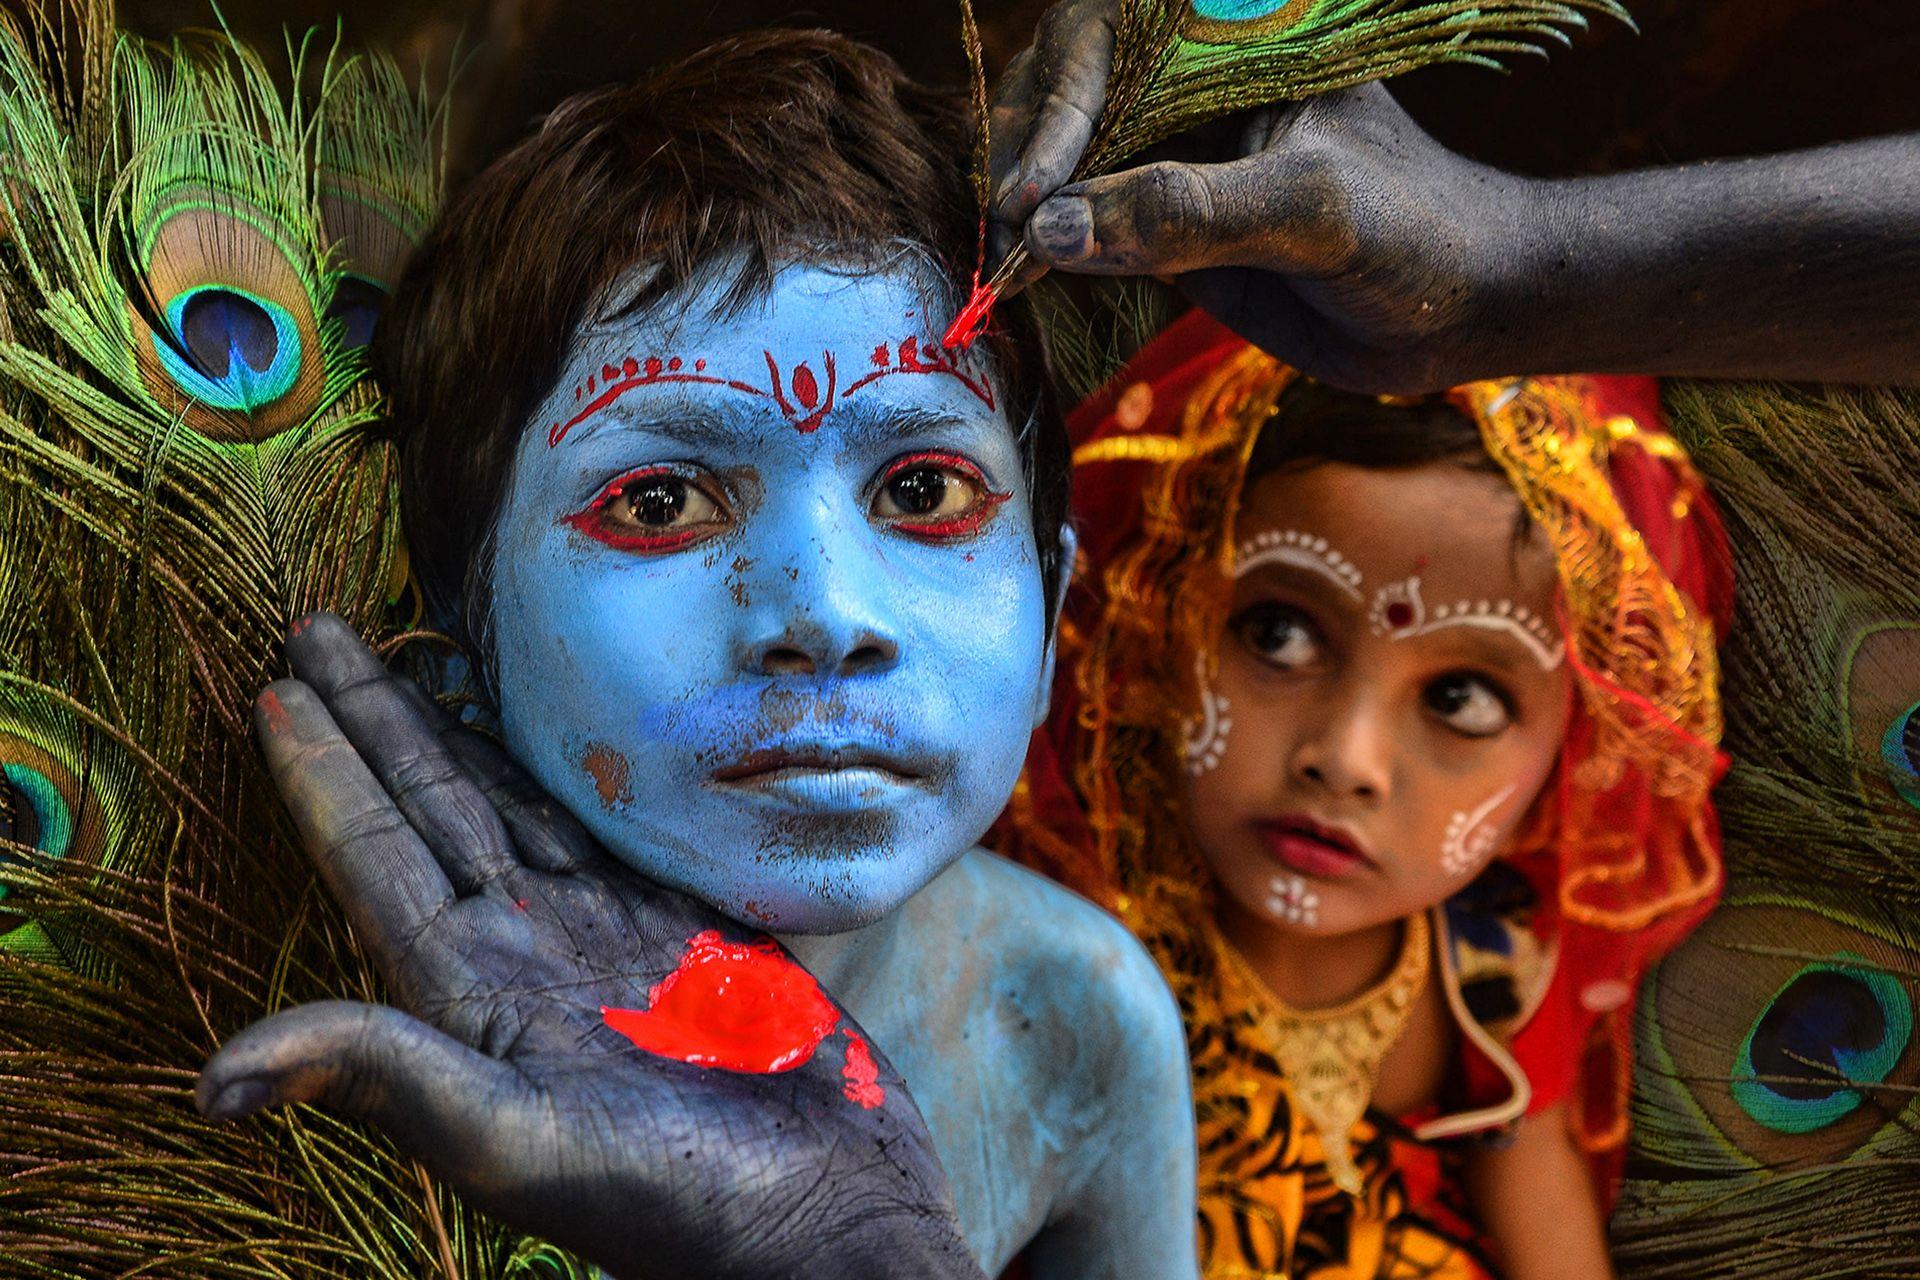 The Make Up by Sanghamitra Sarkar